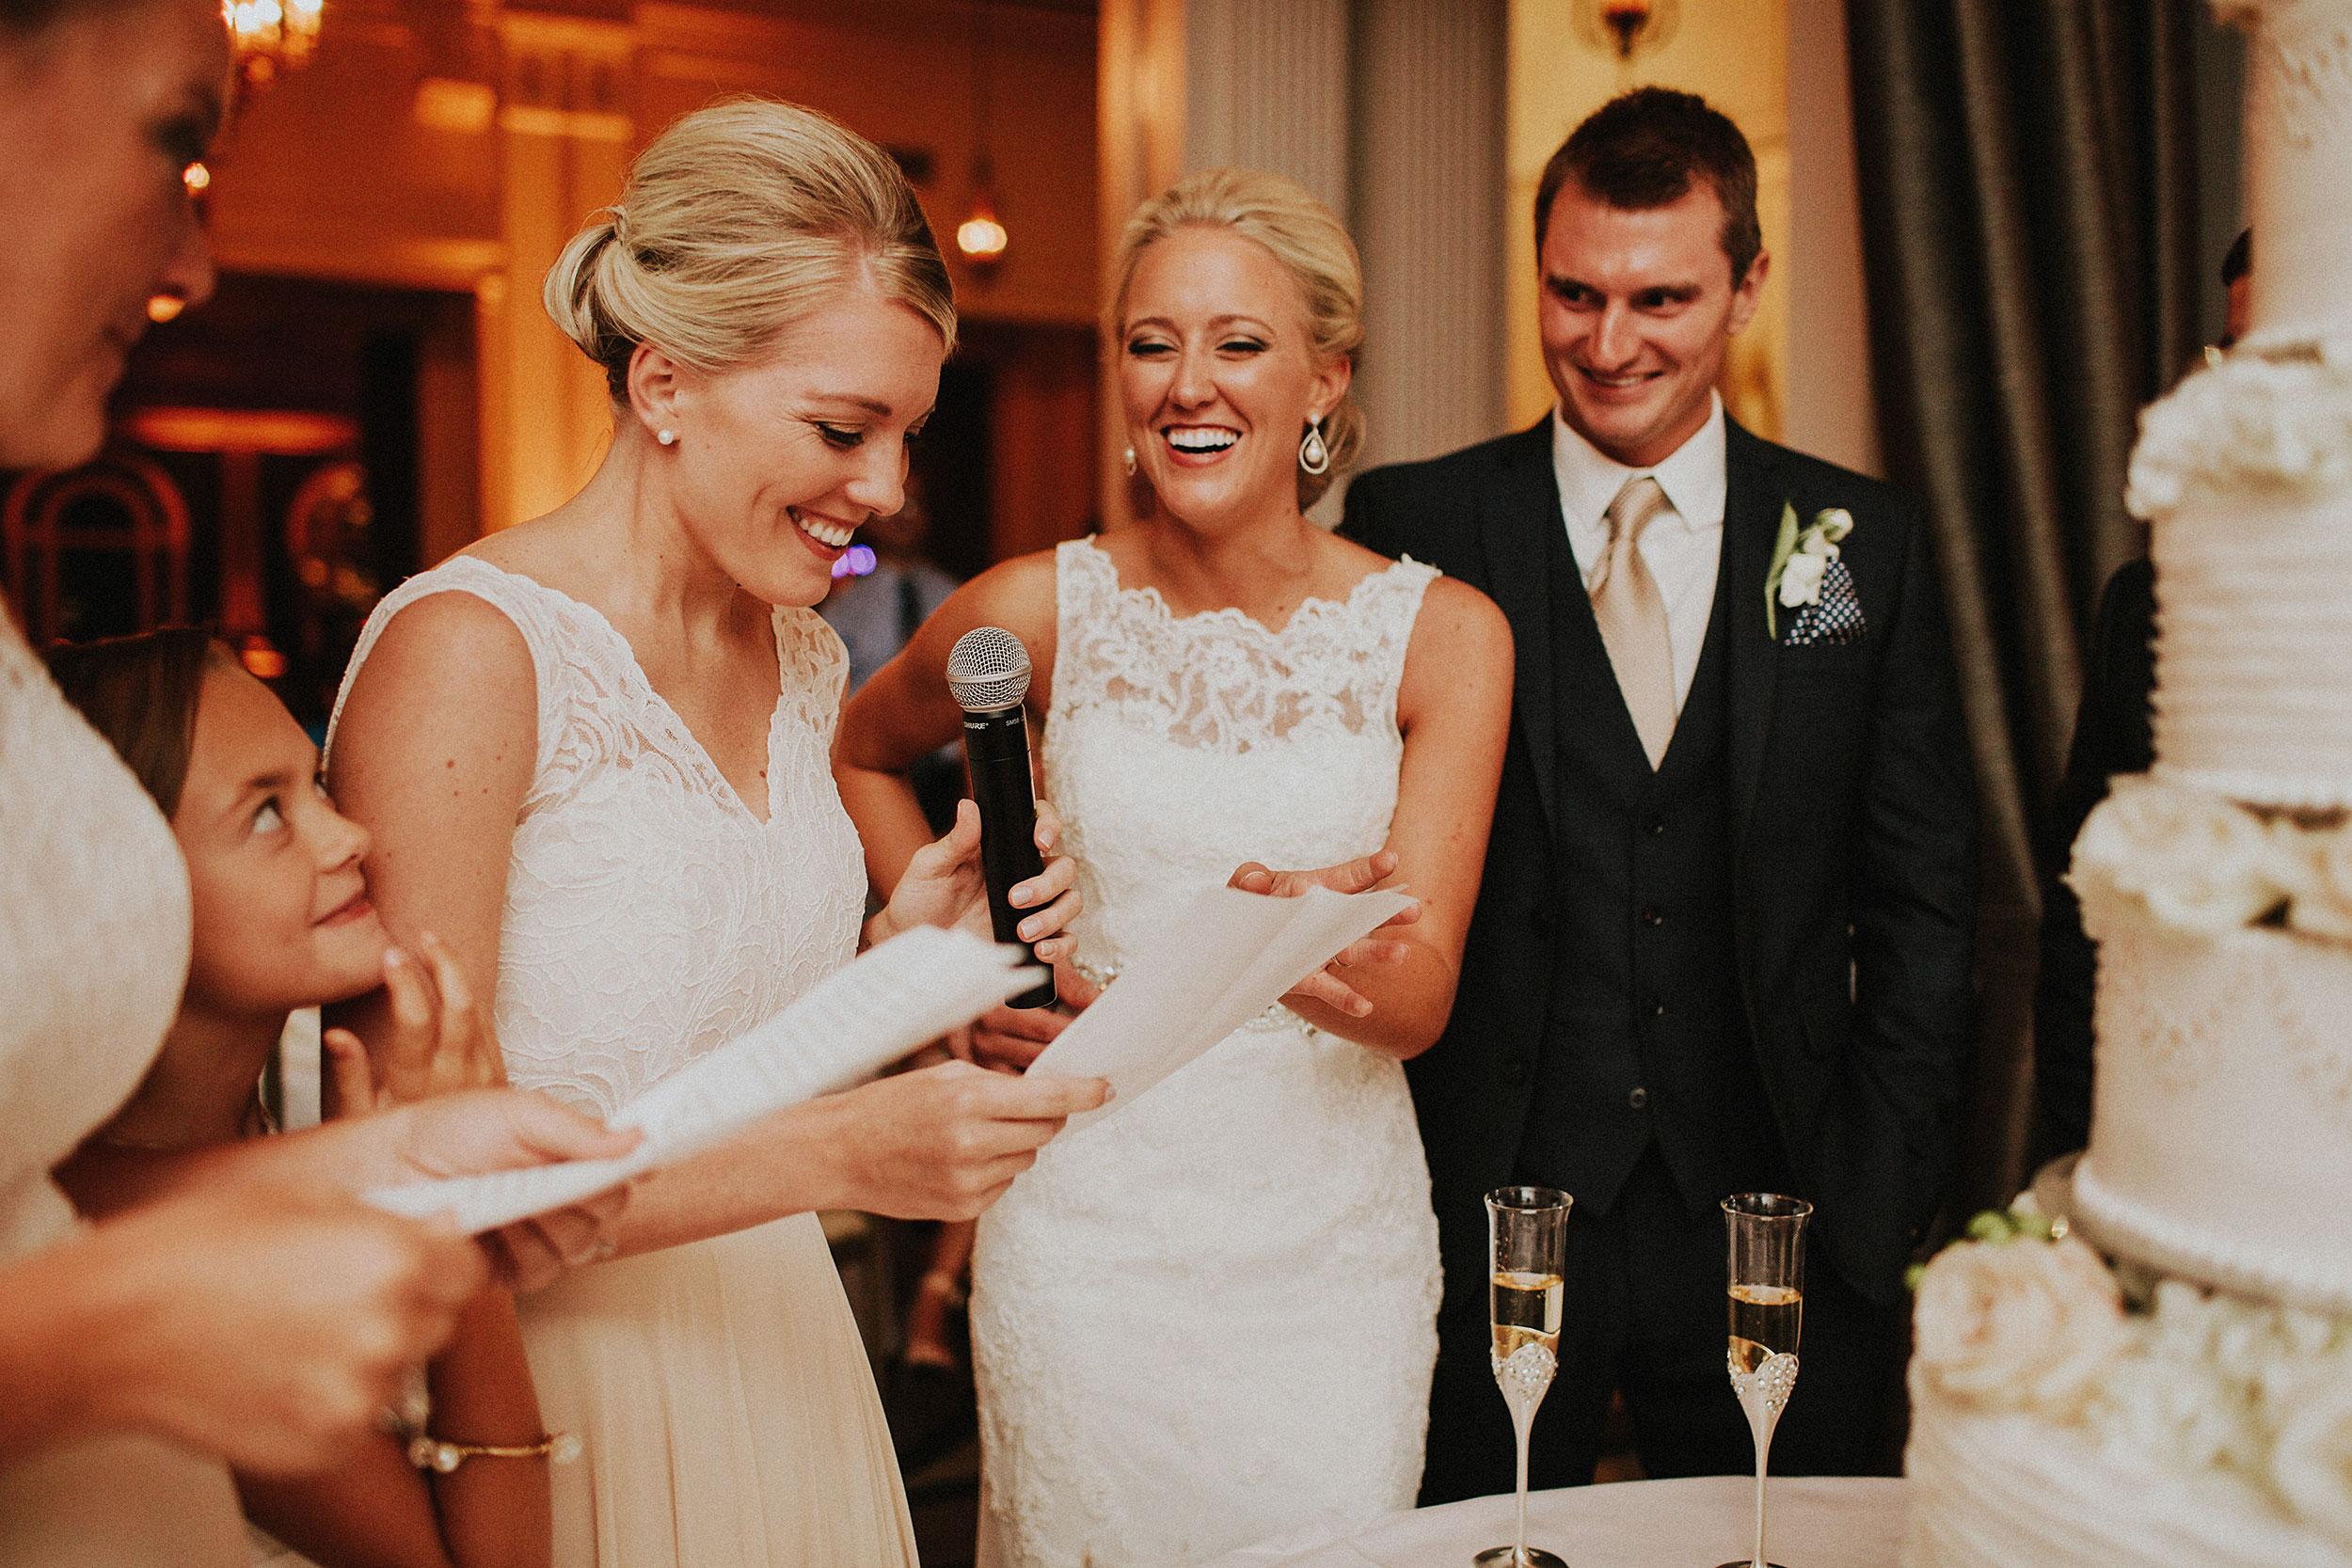 olmsted-wedding-louisville-kentucky-039.JPG